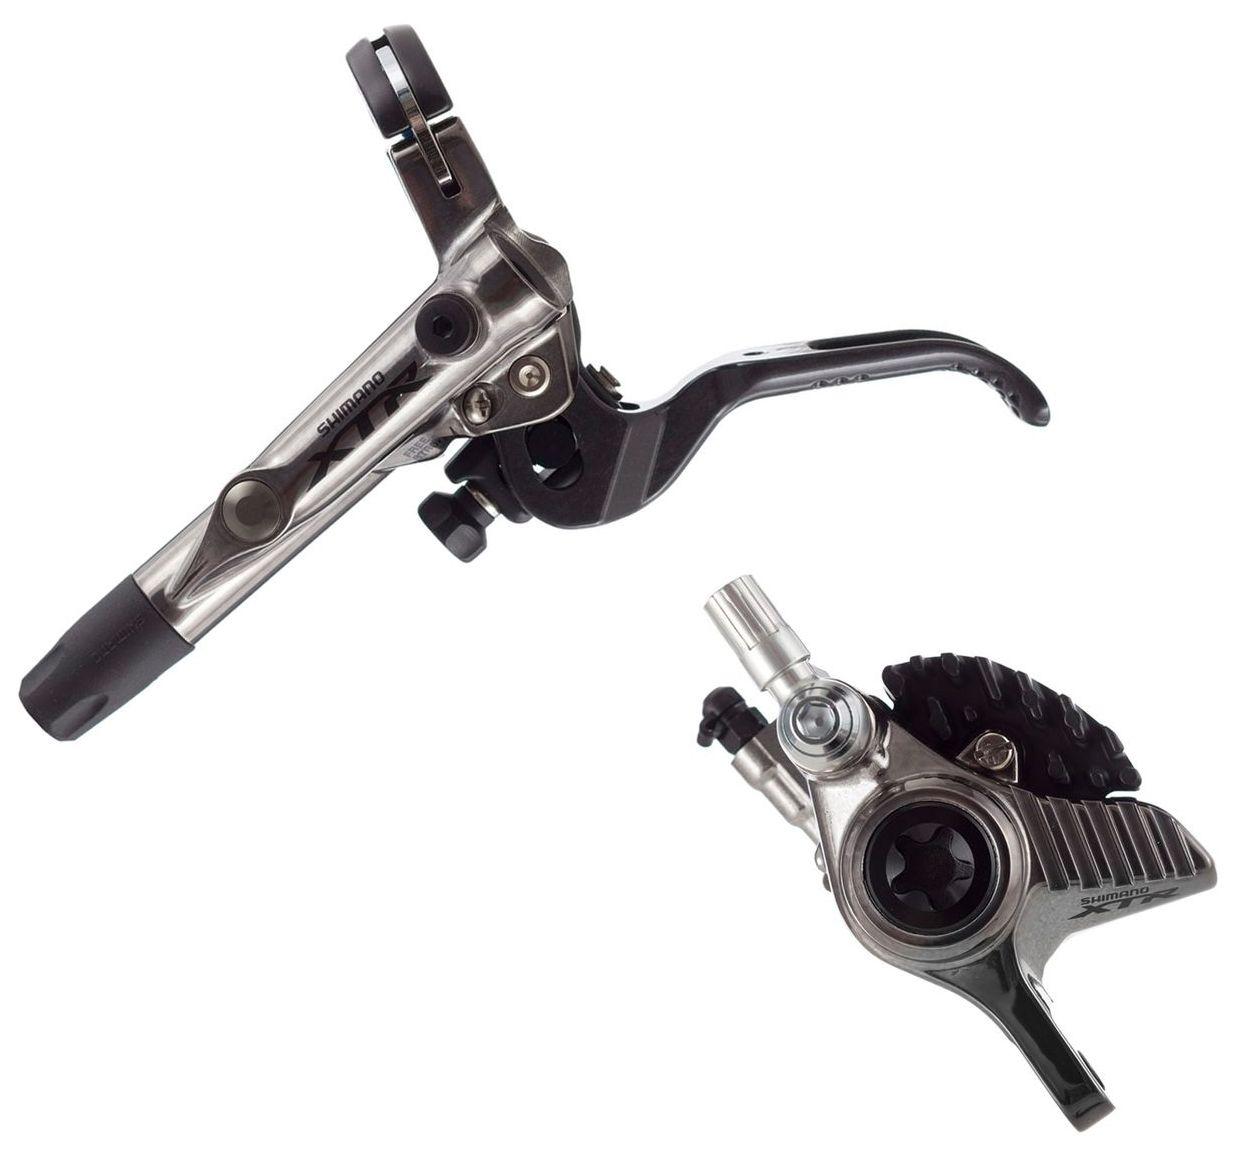 Запчасть Shimano XTR M9020 (IM9020LFPNA100),  тормоза и колодки  - артикул:286207